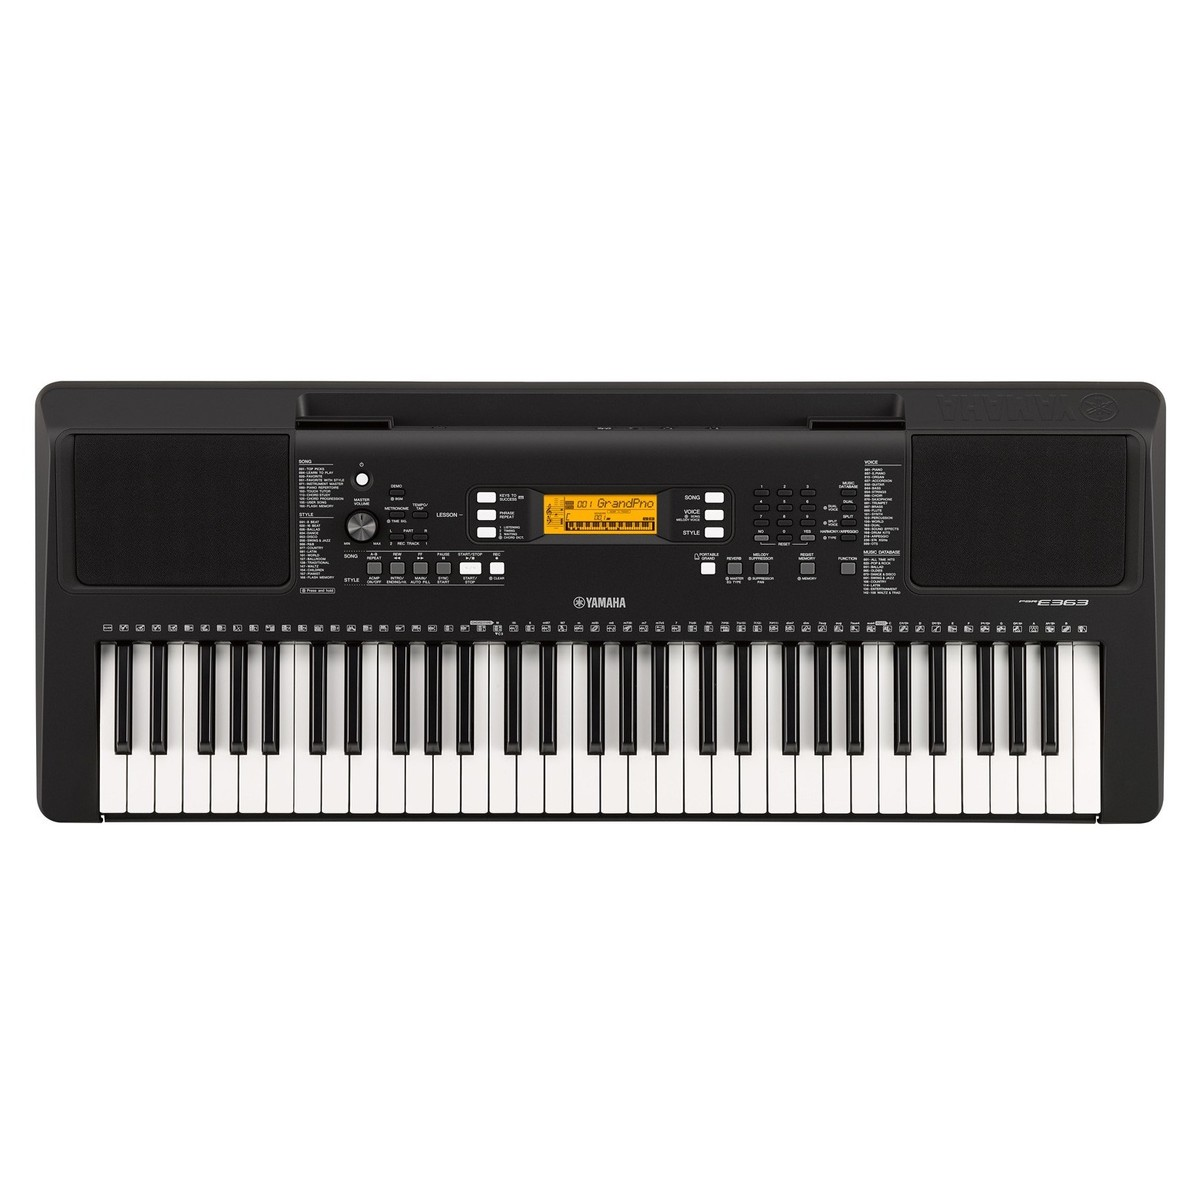 yamaha psr e363 portable keyboard b stock at gear4music. Black Bedroom Furniture Sets. Home Design Ideas